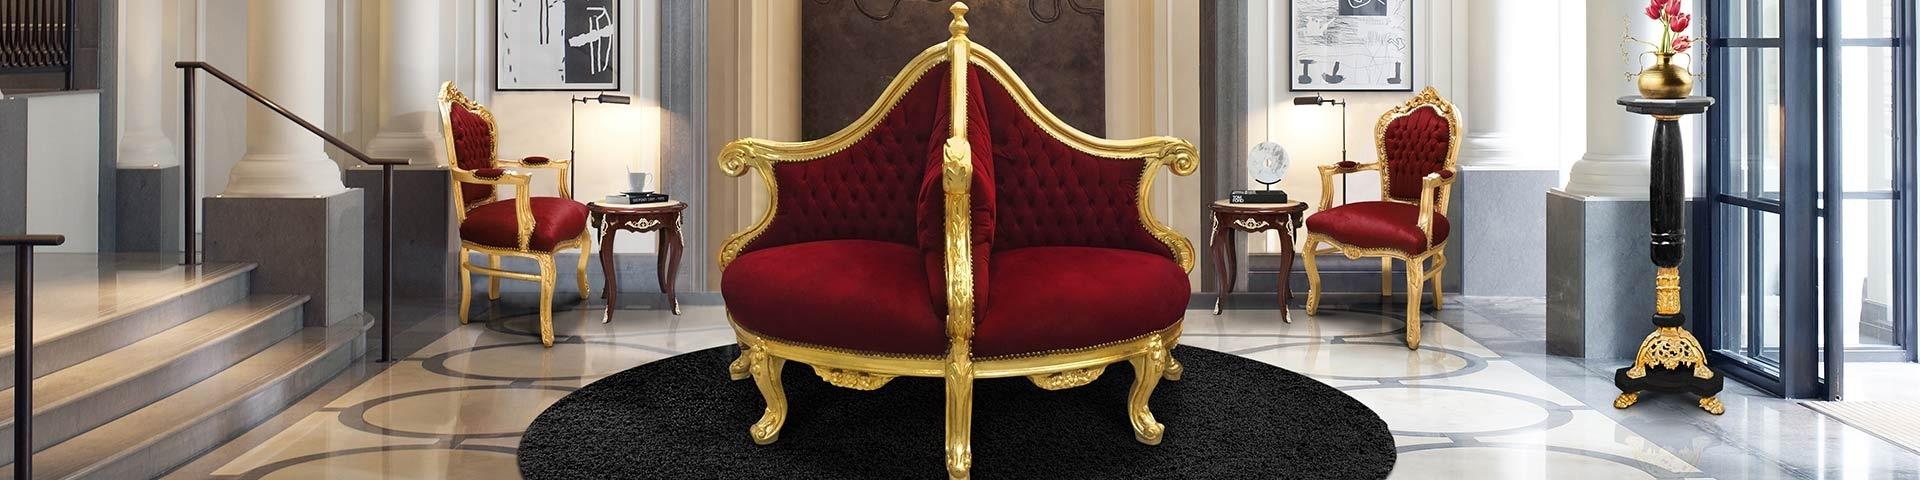 Mobilier Baroque 2